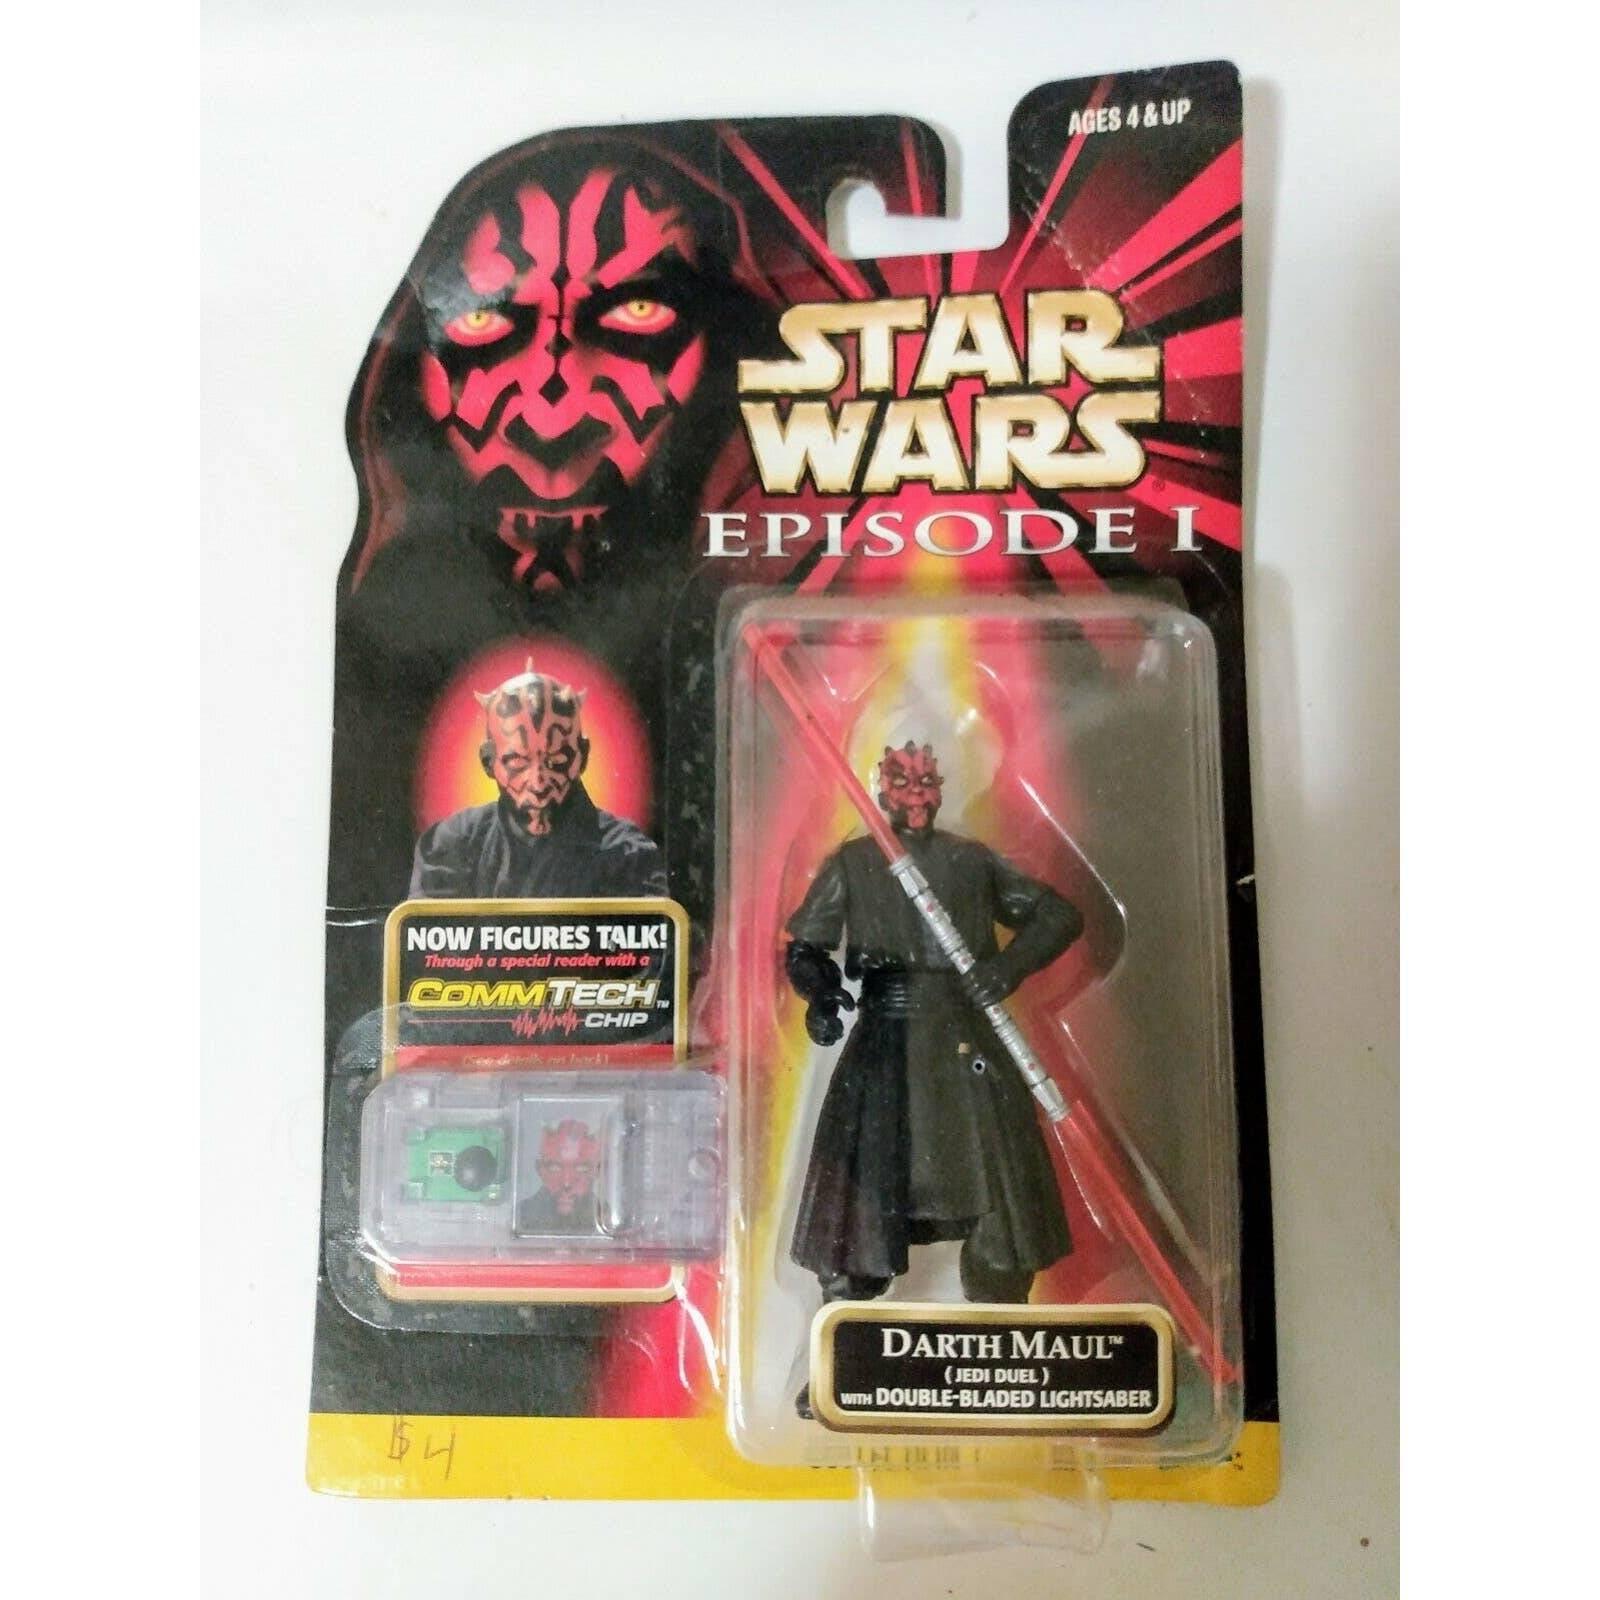 Star Wars Darth Maul w/ CommTech Chip